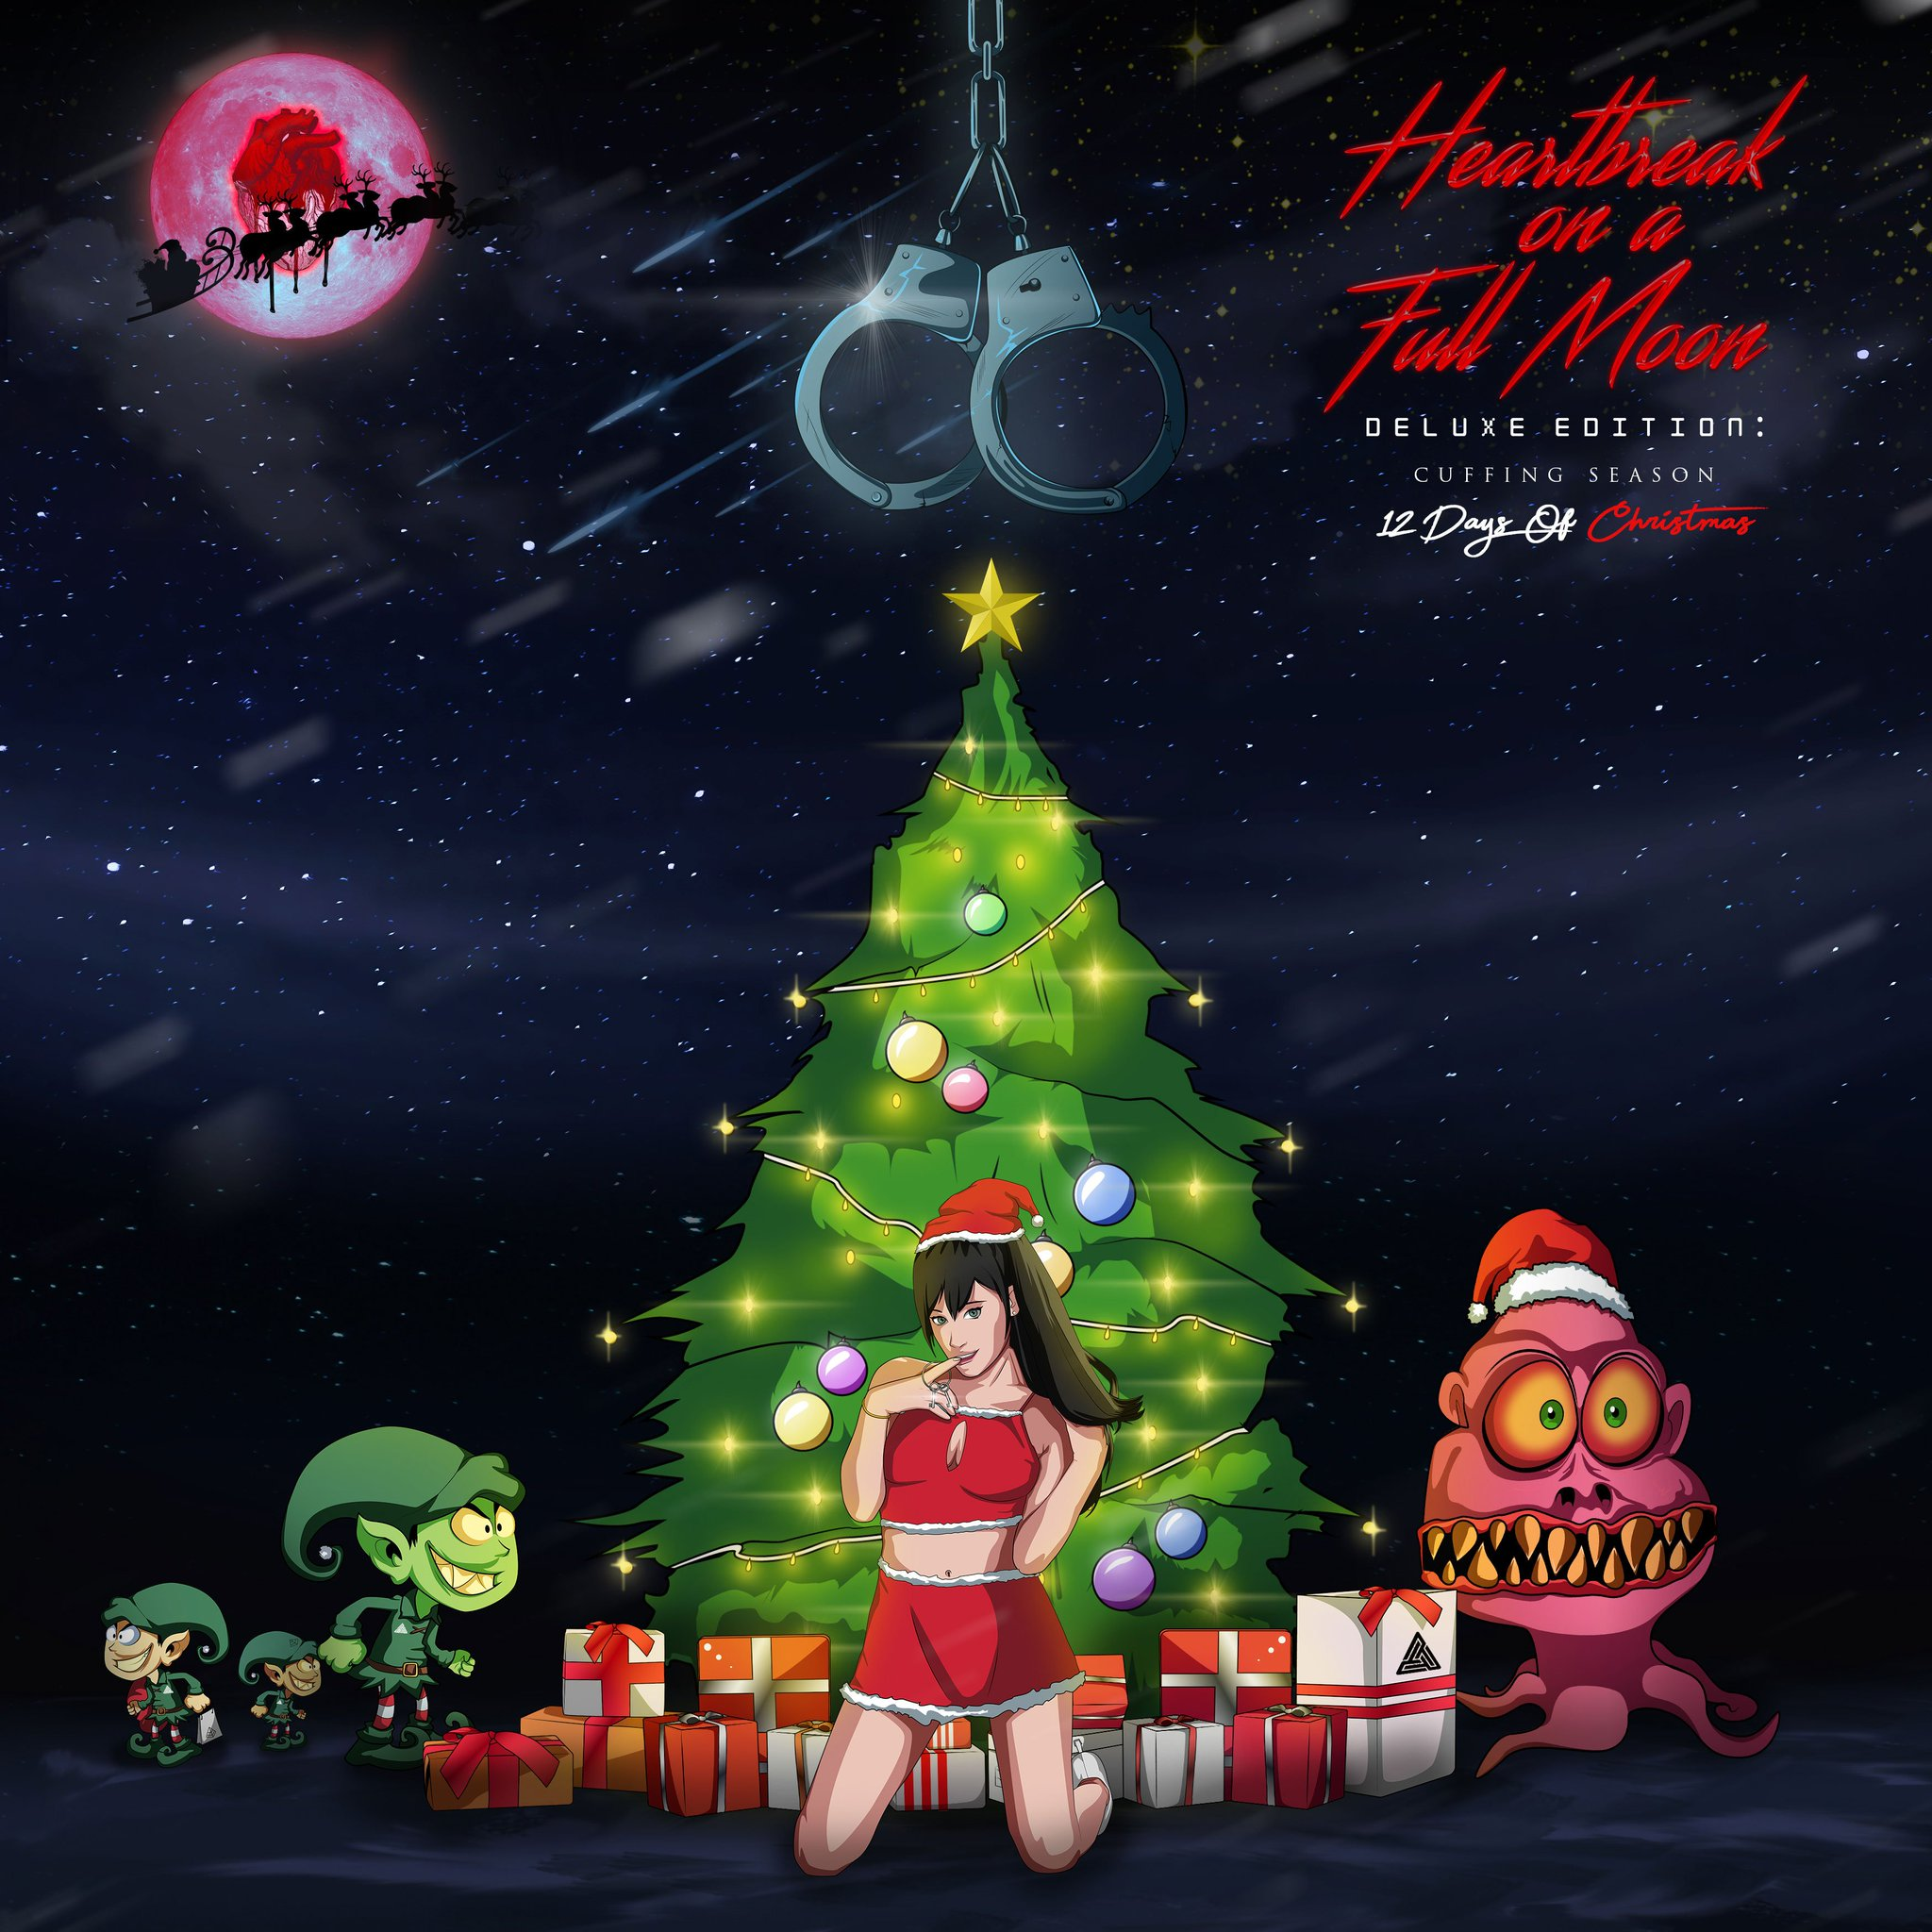 Stream 12 Days Of Christmas: CUFFING SEASON on @Spotify 🎄 🎁 ❤️ https://t.co/O478P4fTEz https://t.co/t1WAY6n5Jc